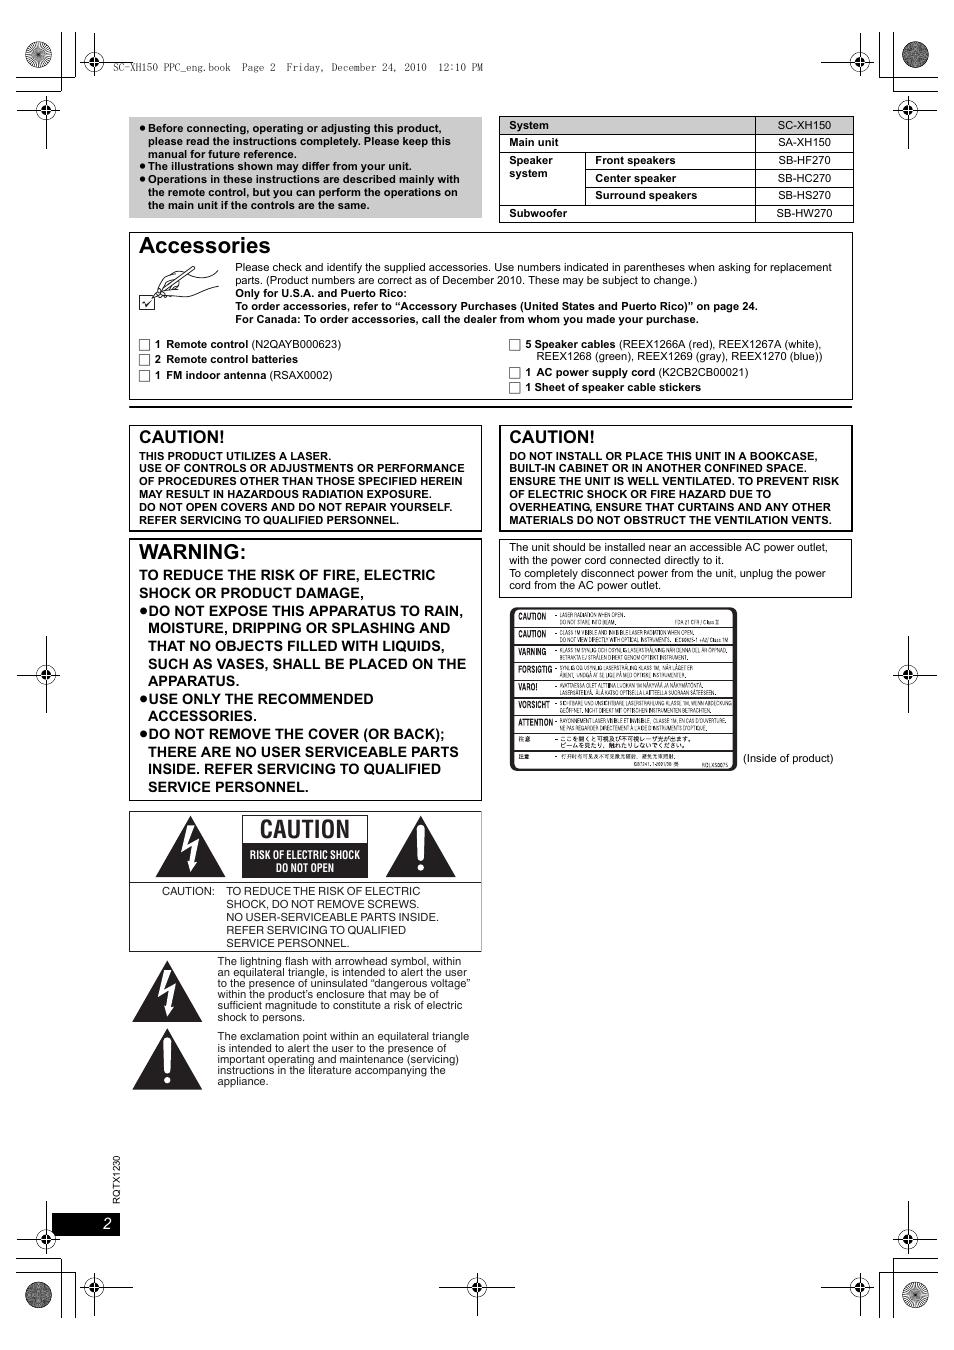 accessories warning caution panasonic sc xh150 user manual rh manualsdir com Panasonic Manual Ra 6800 Panasonic Cordless Phones